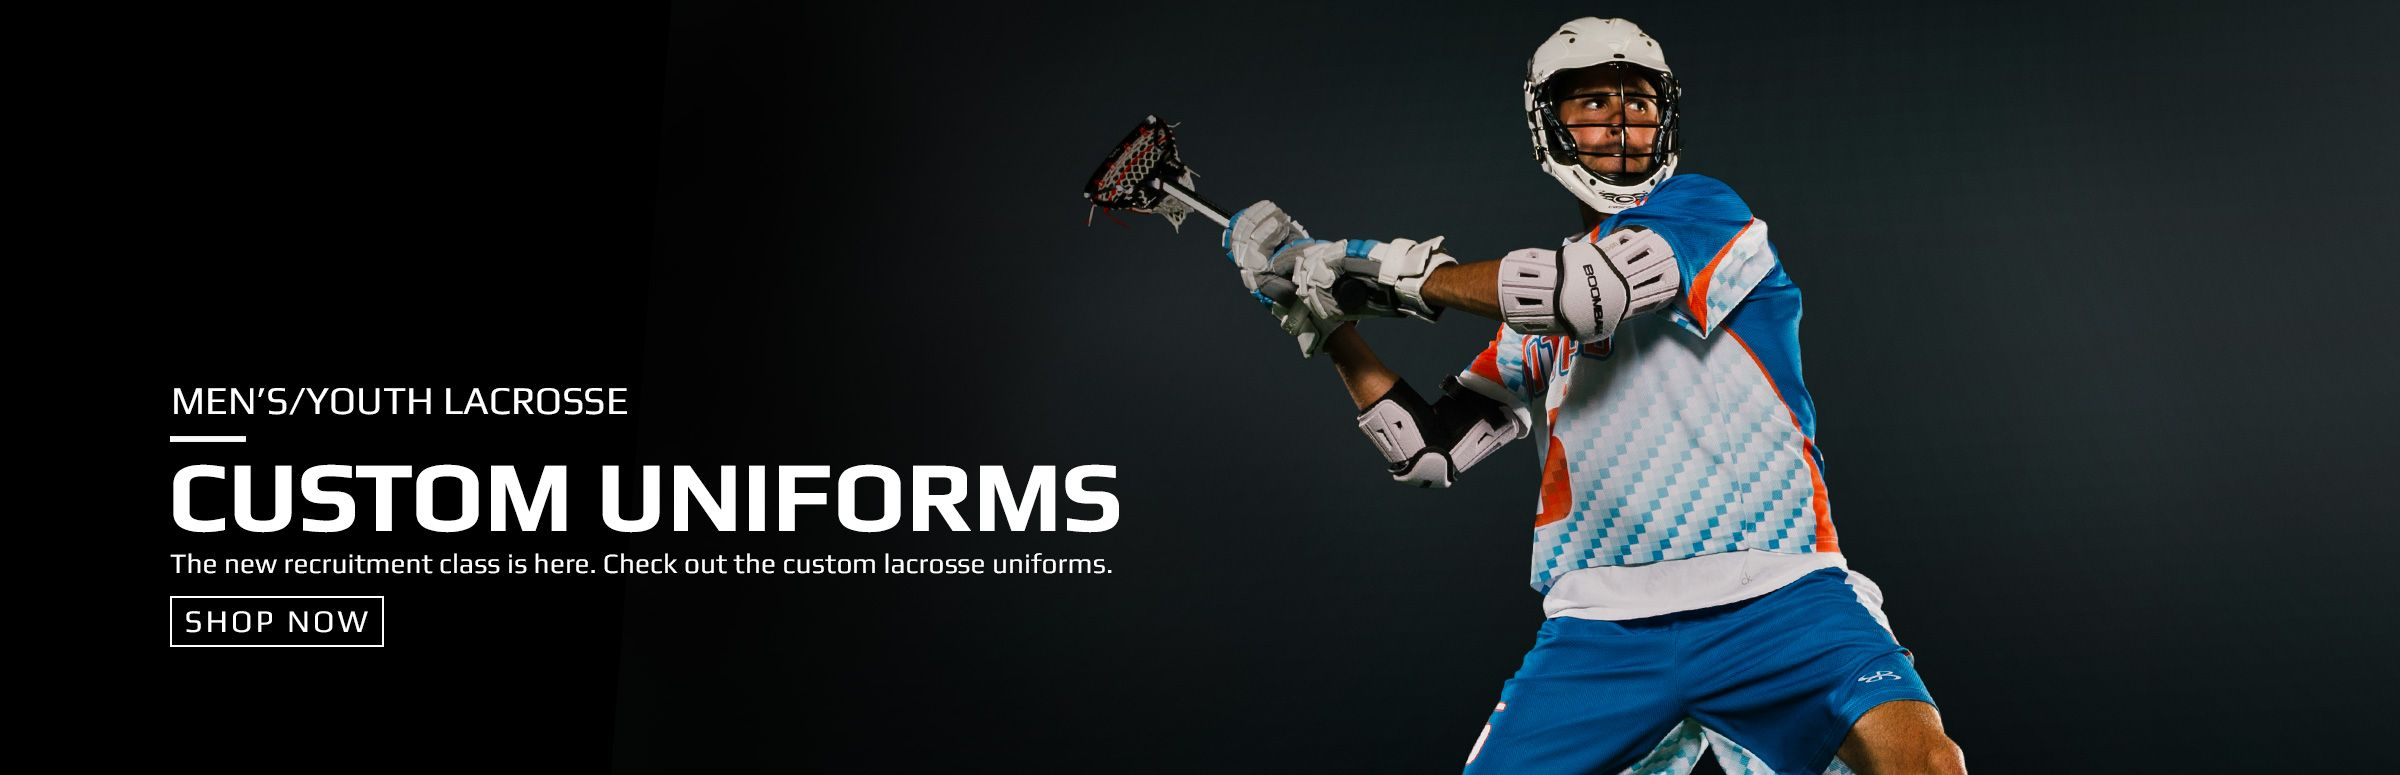 2cabed2668 Boombah Custom lacrosse Uniforms ...